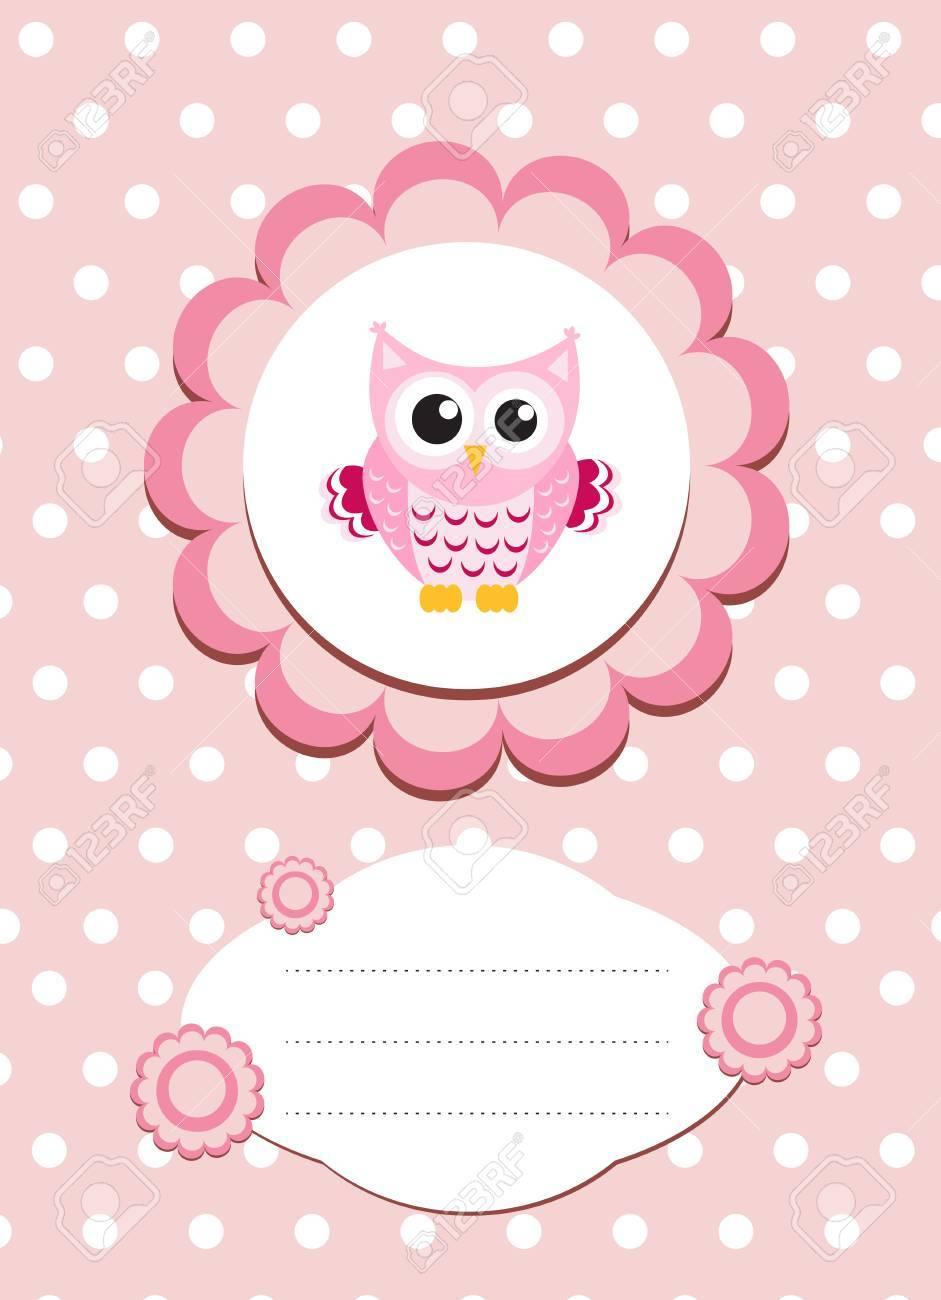 Baby card cute owl baby owl invitation frame for text cute baby card cute owl baby owl invitation frame for text cute animal cartoon stopboris Choice Image